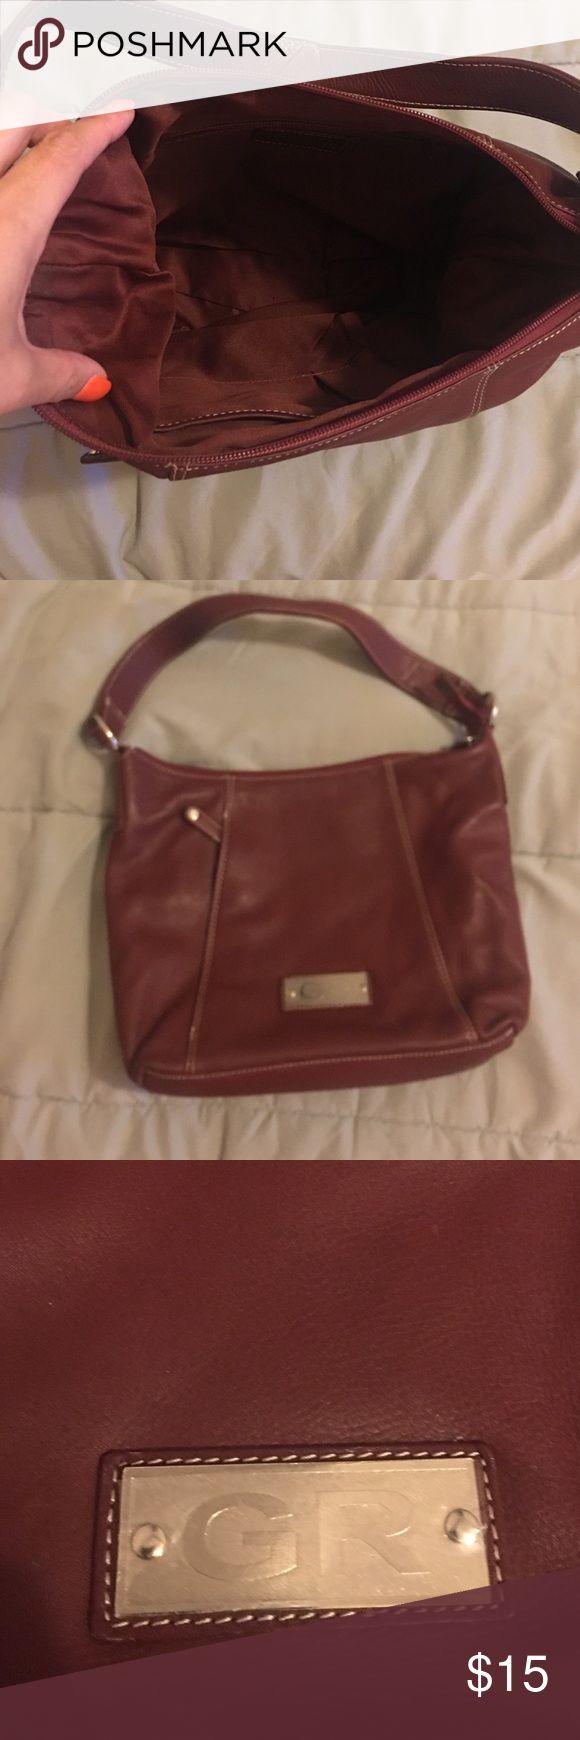 Burgundy color. Medium sized bag. Brand New! Medium sizes bag. Brand new! George Rech Bags Shoulder Bags